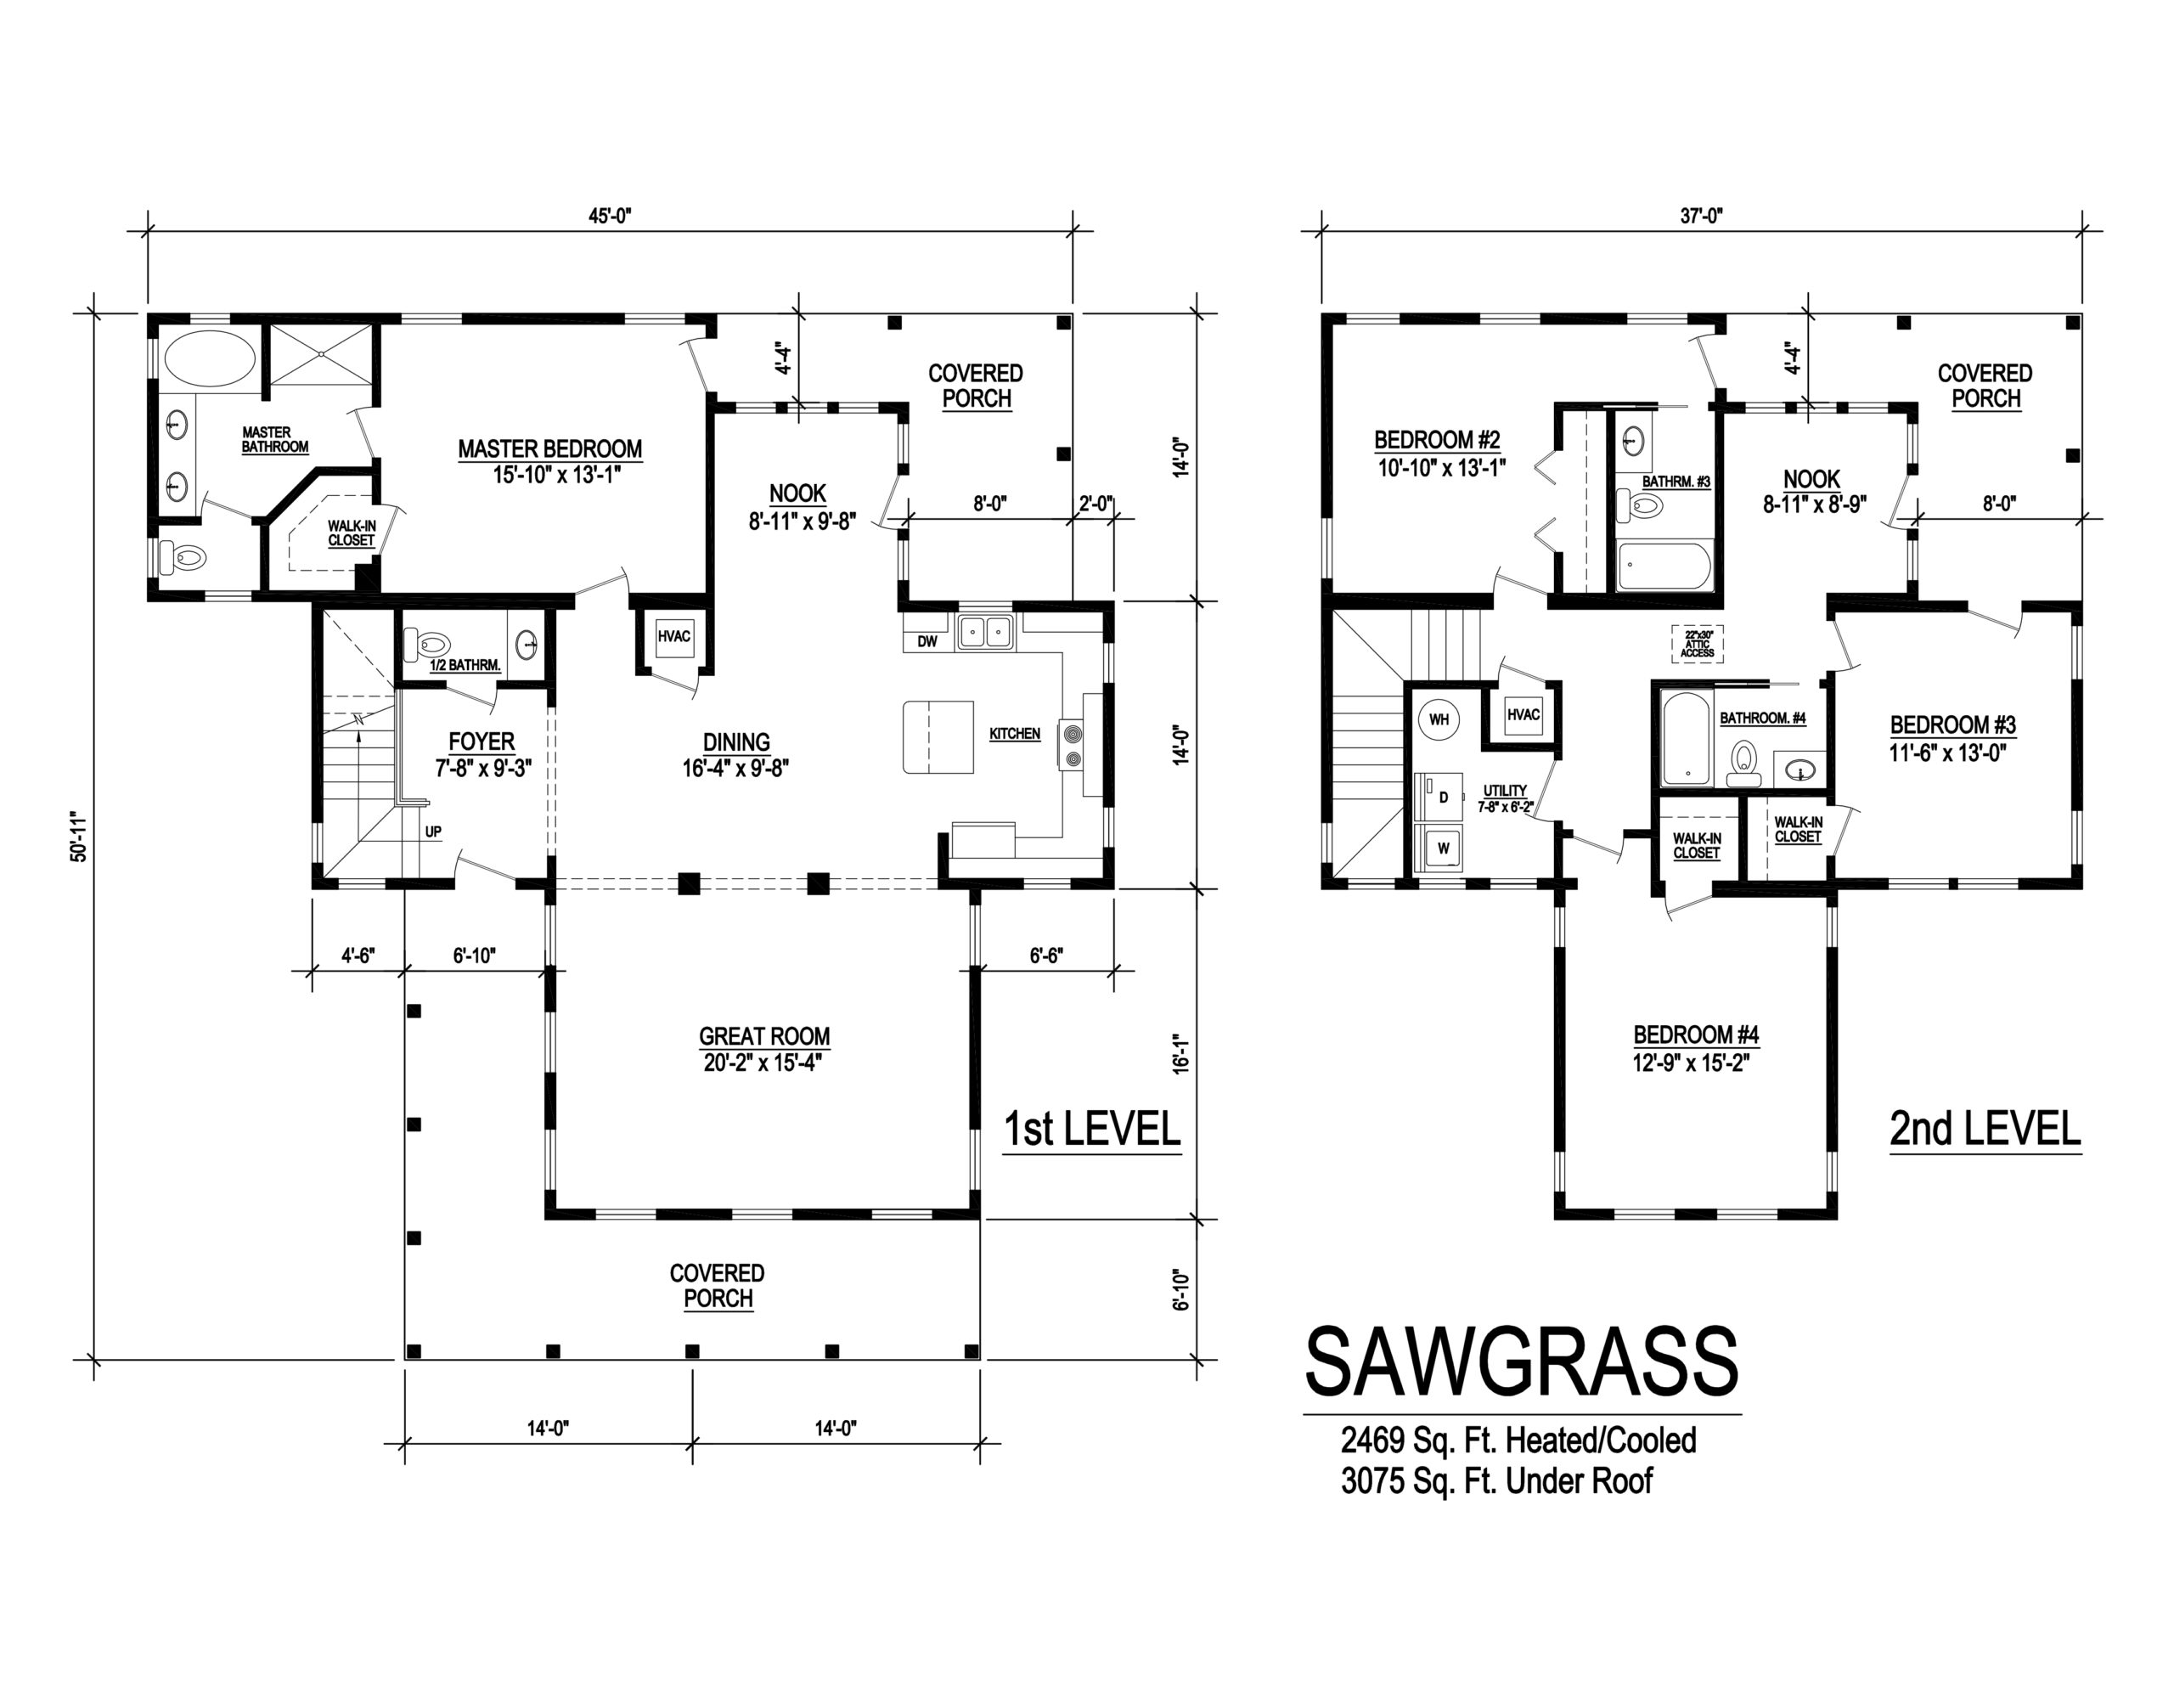 sawgrass modular home floorplan